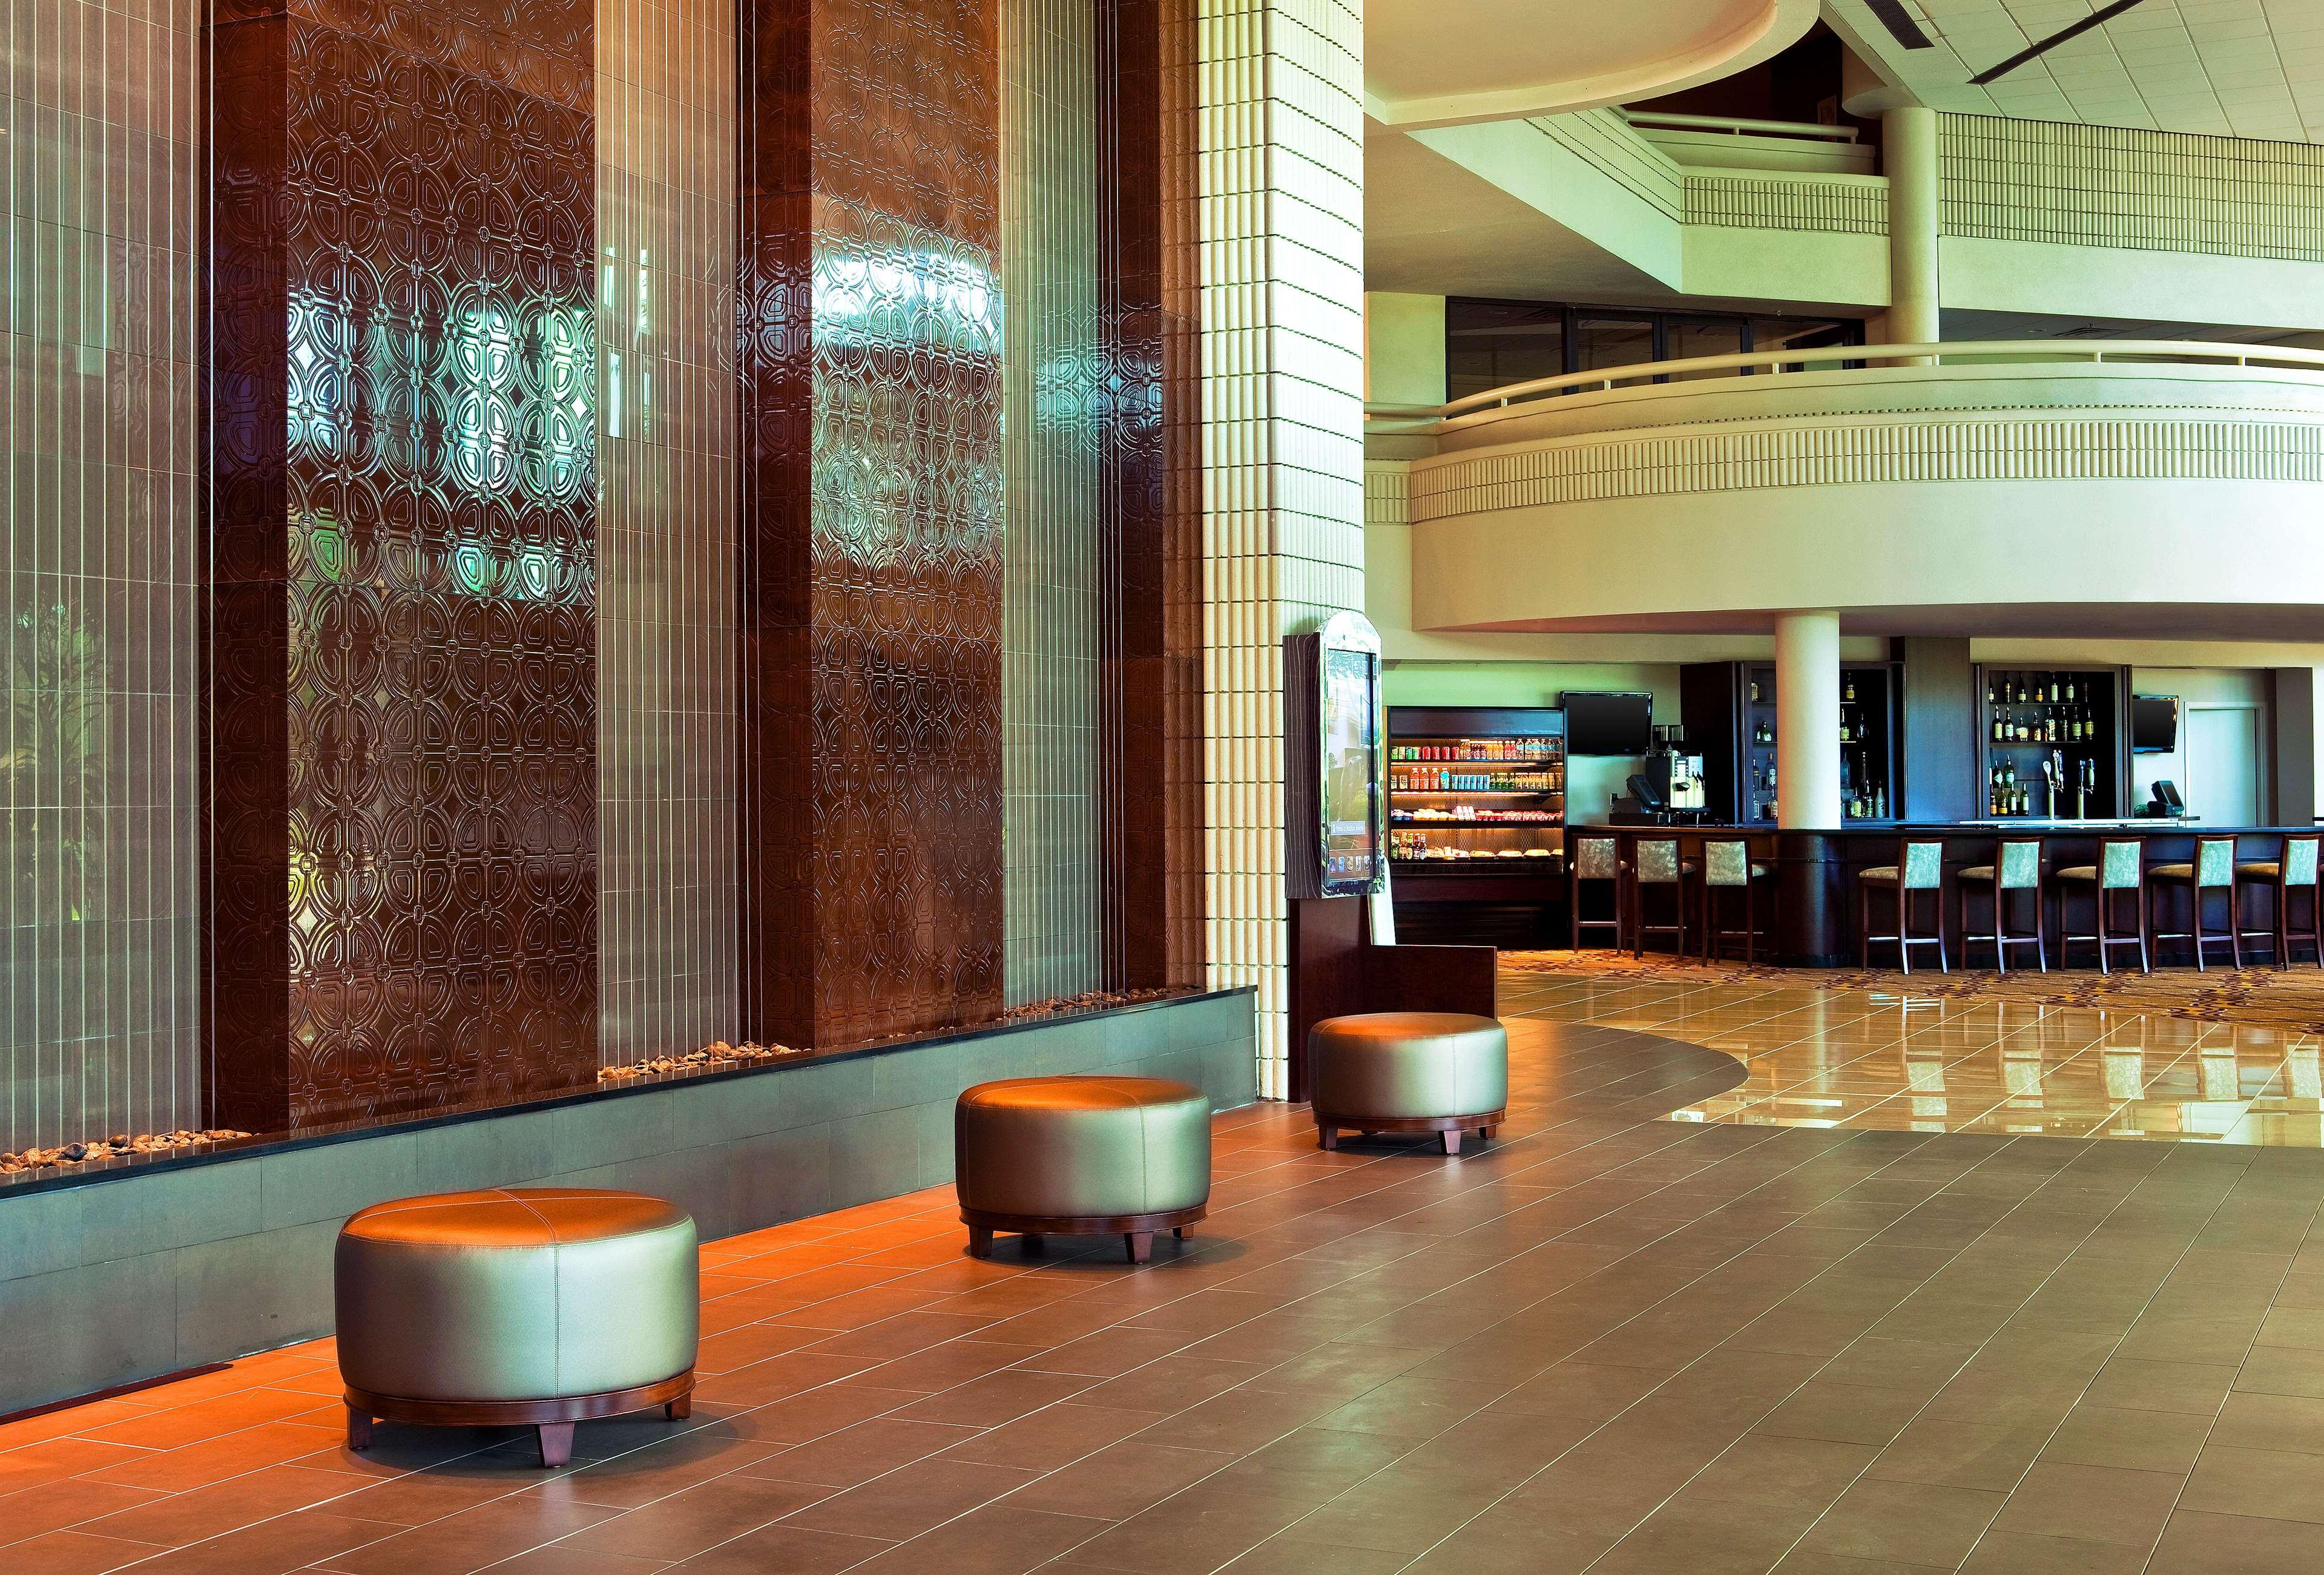 Sheraton Tampa Brandon Hotel image 1